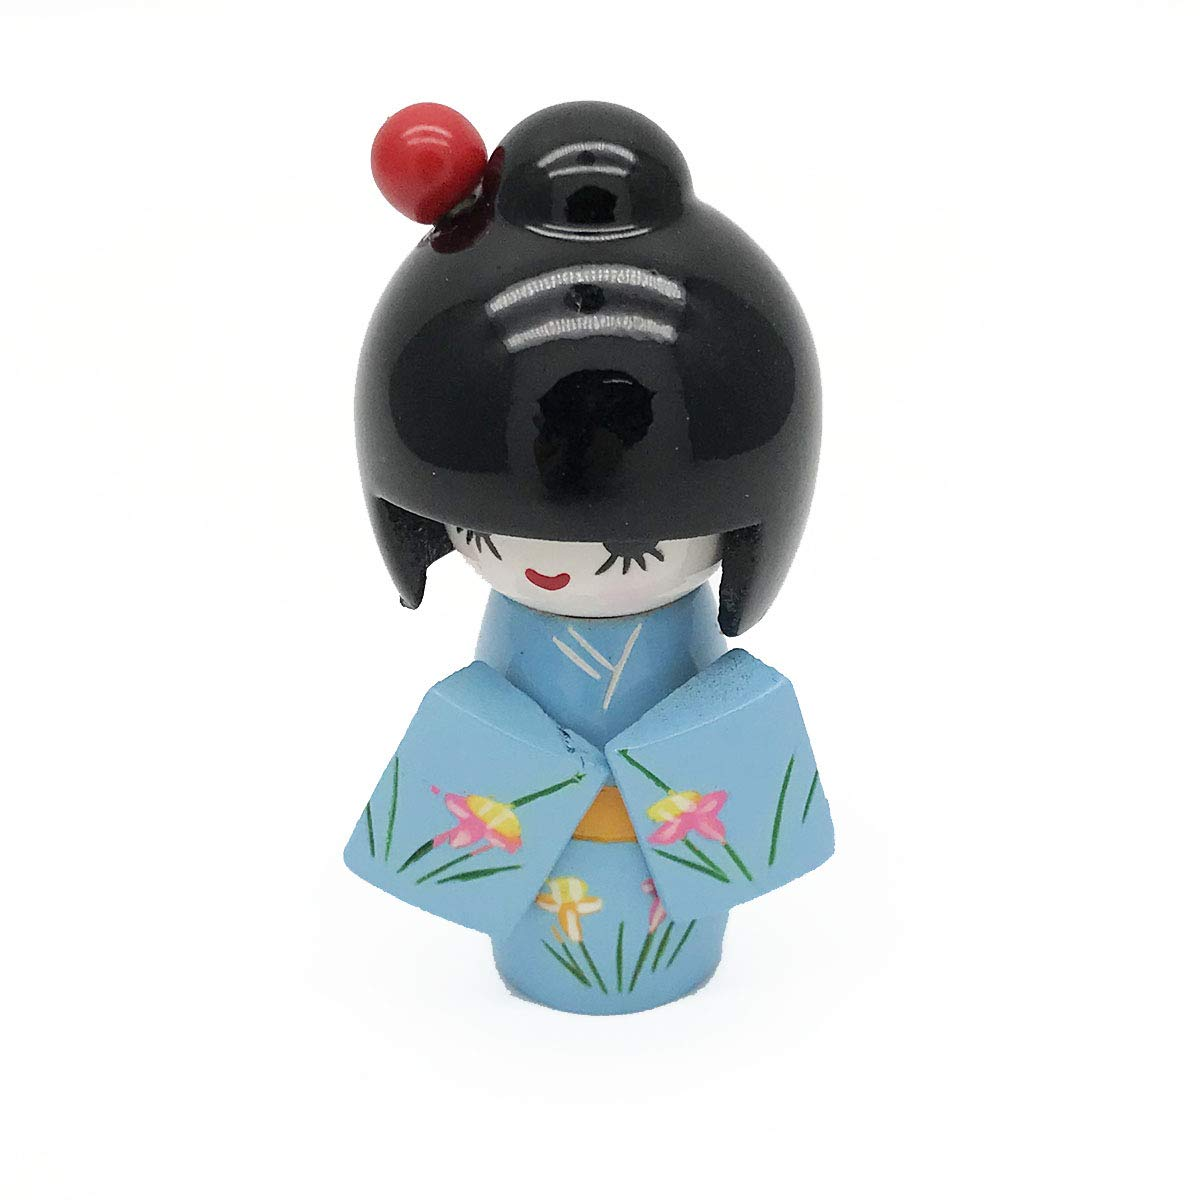 Amazon.com: XMHF - Muñeca de madera, estilo japonés, color ...